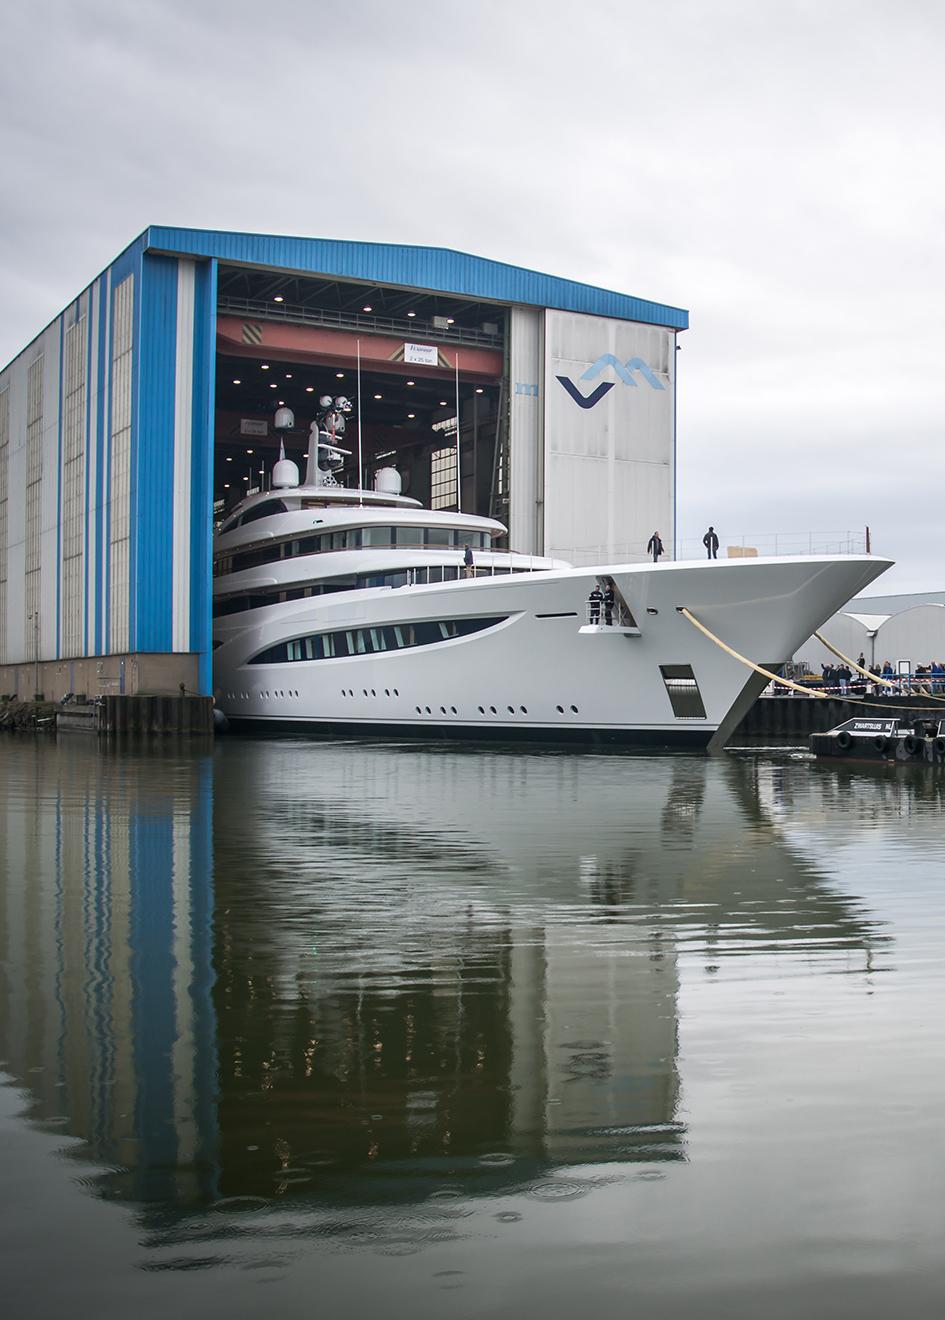 feadship-super-yacht-faith-leaving-the-makkum-shed